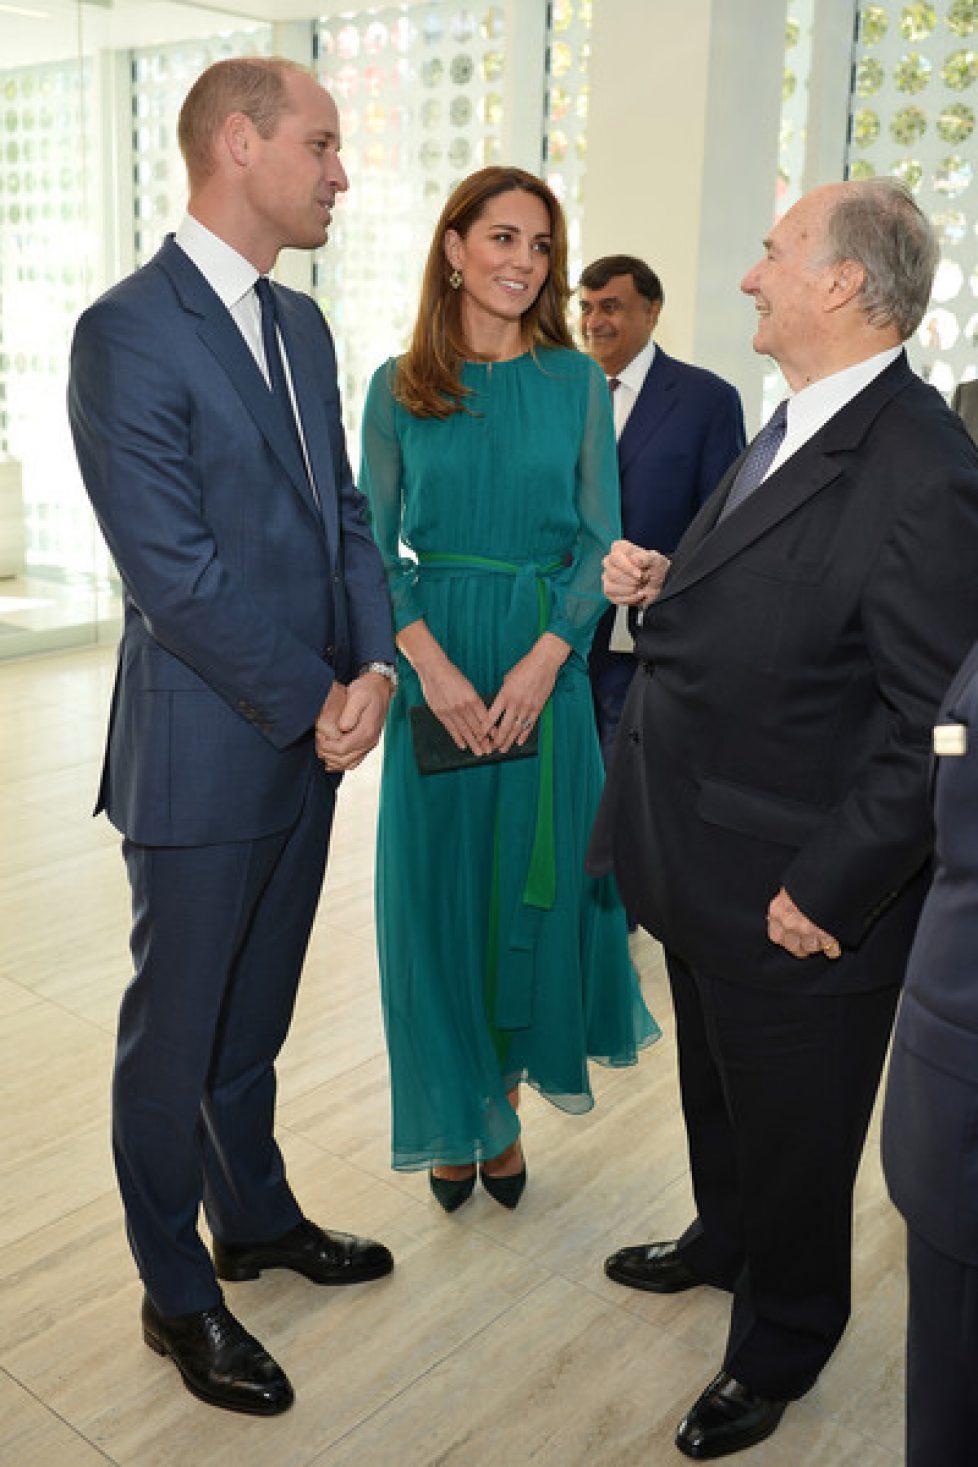 Duke+Duchess+Cambridge+Visit+Aga+Khan+Centre+NCsxjhfITjul